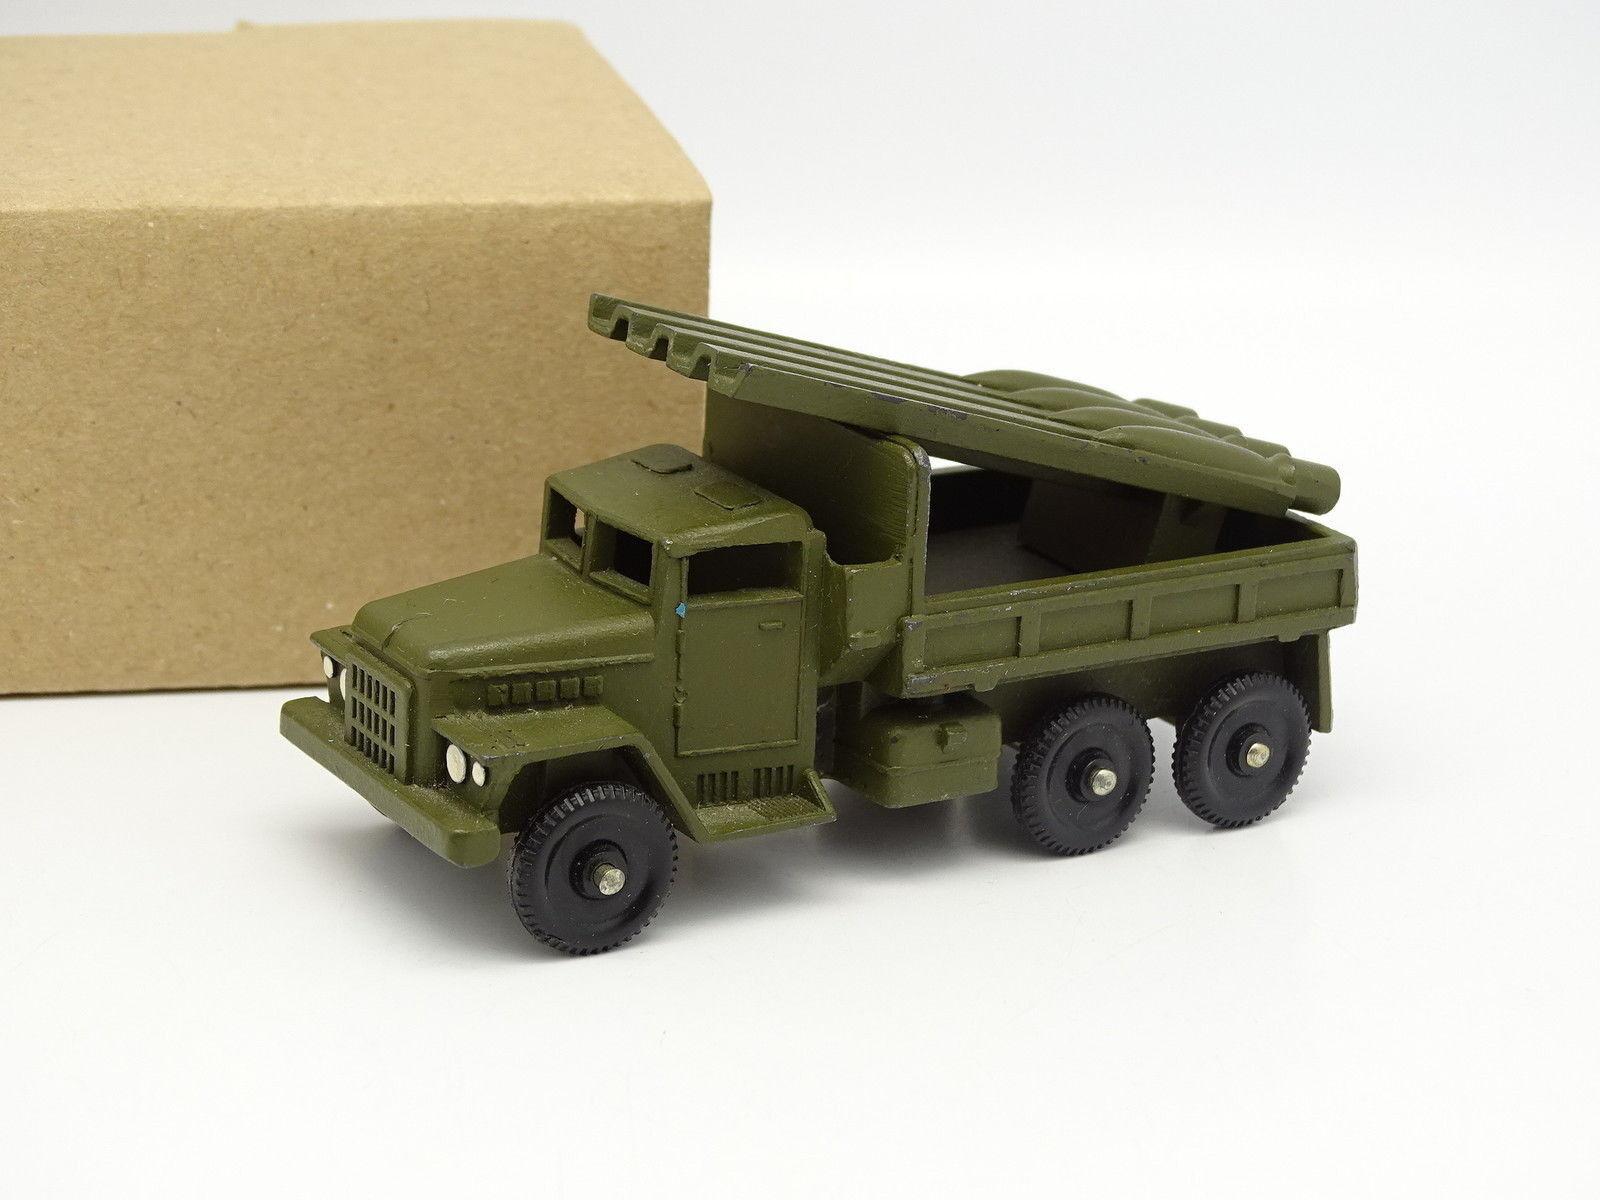 Russland SB 1 64 64 64 - Ural 375 6x6 -werfer Raketen Katiusha Militär Armee f26219